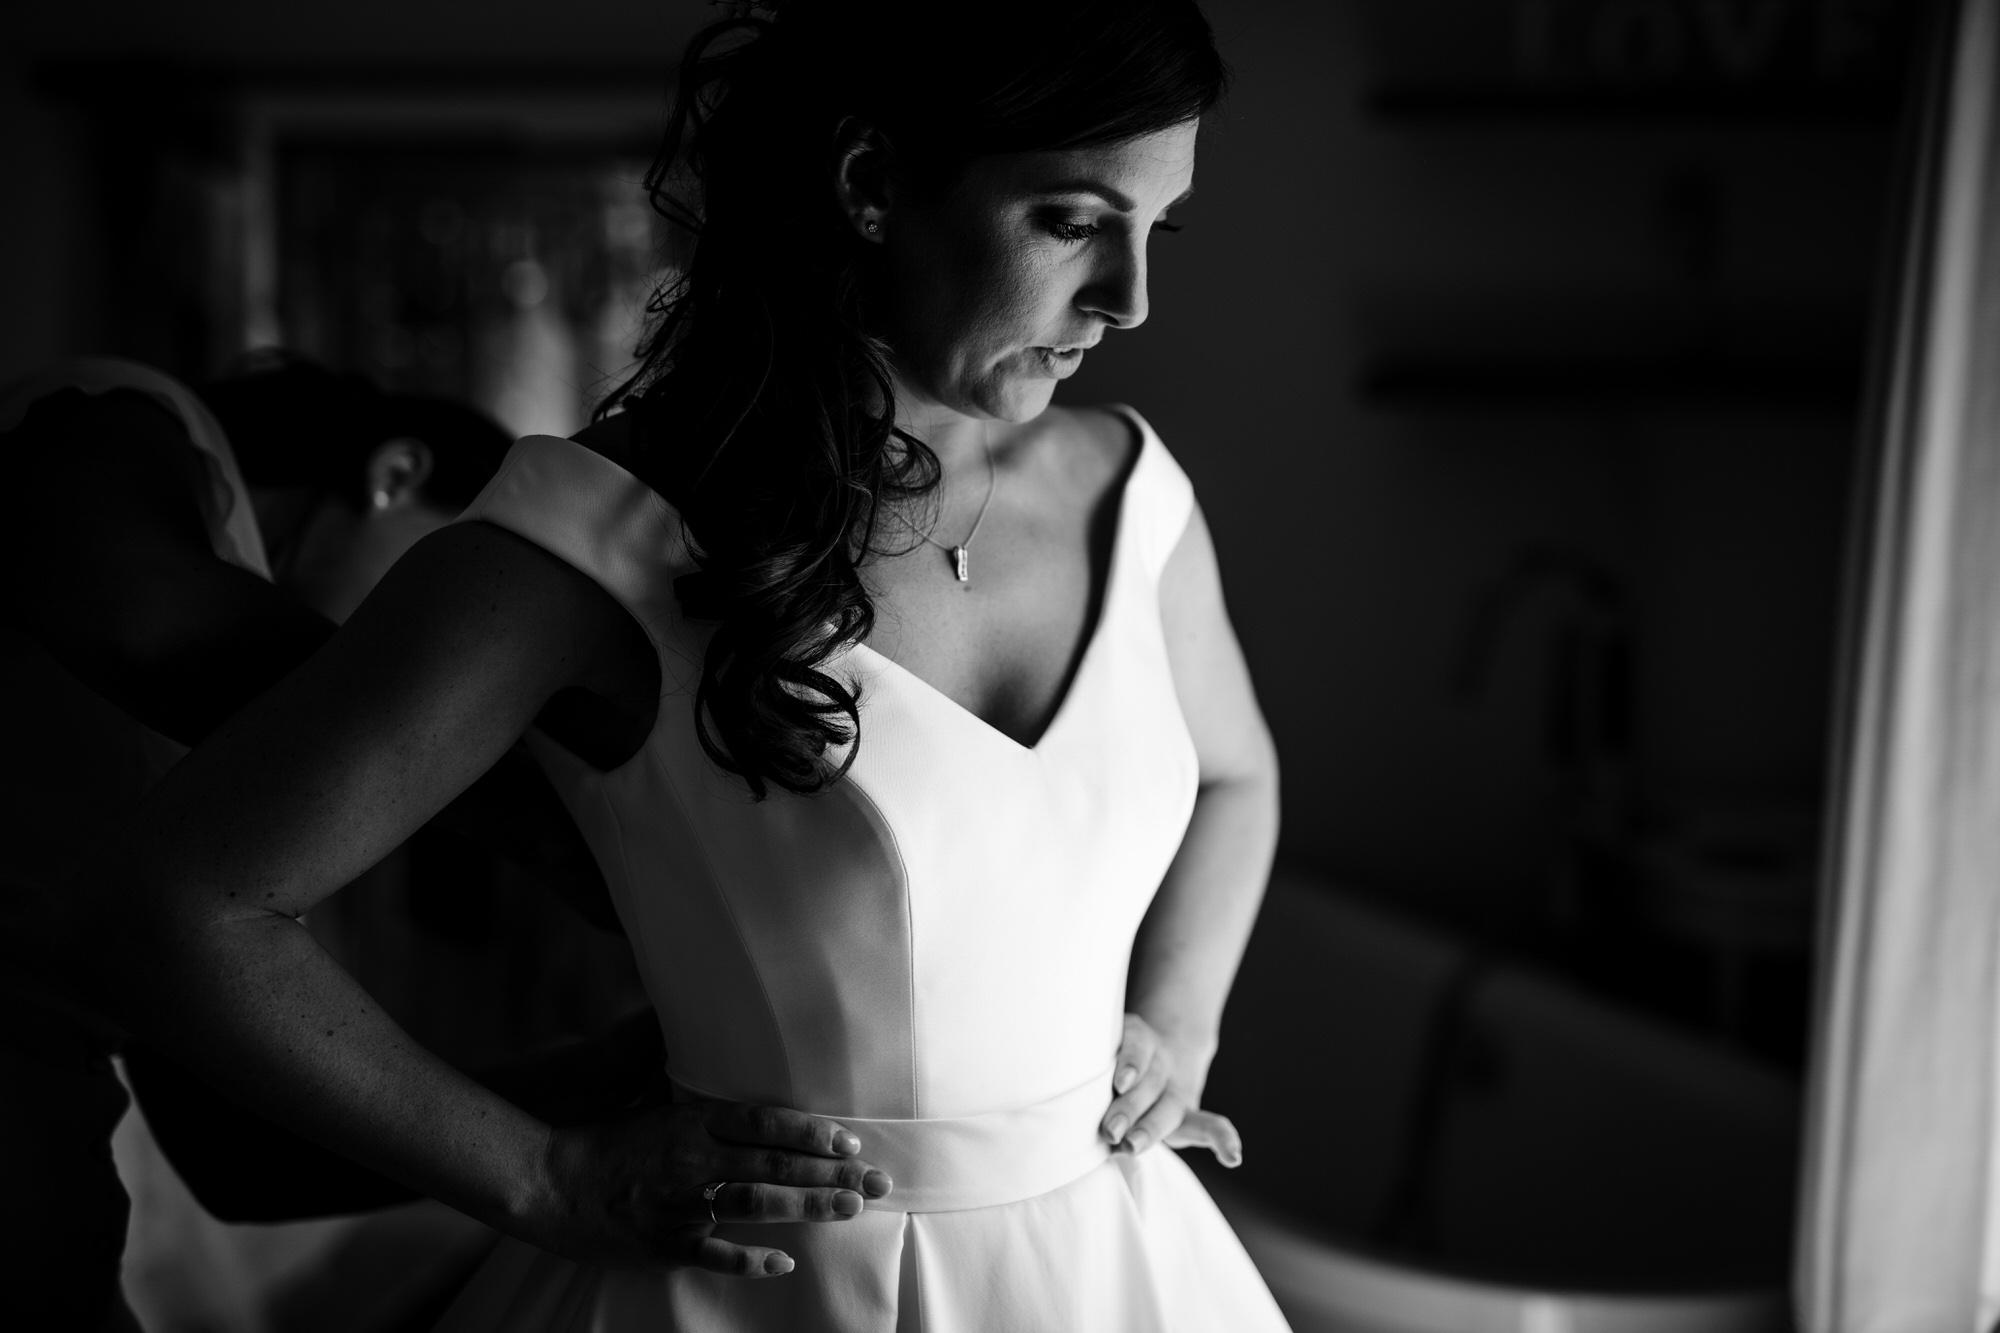 Shilstone wedding photographer 7